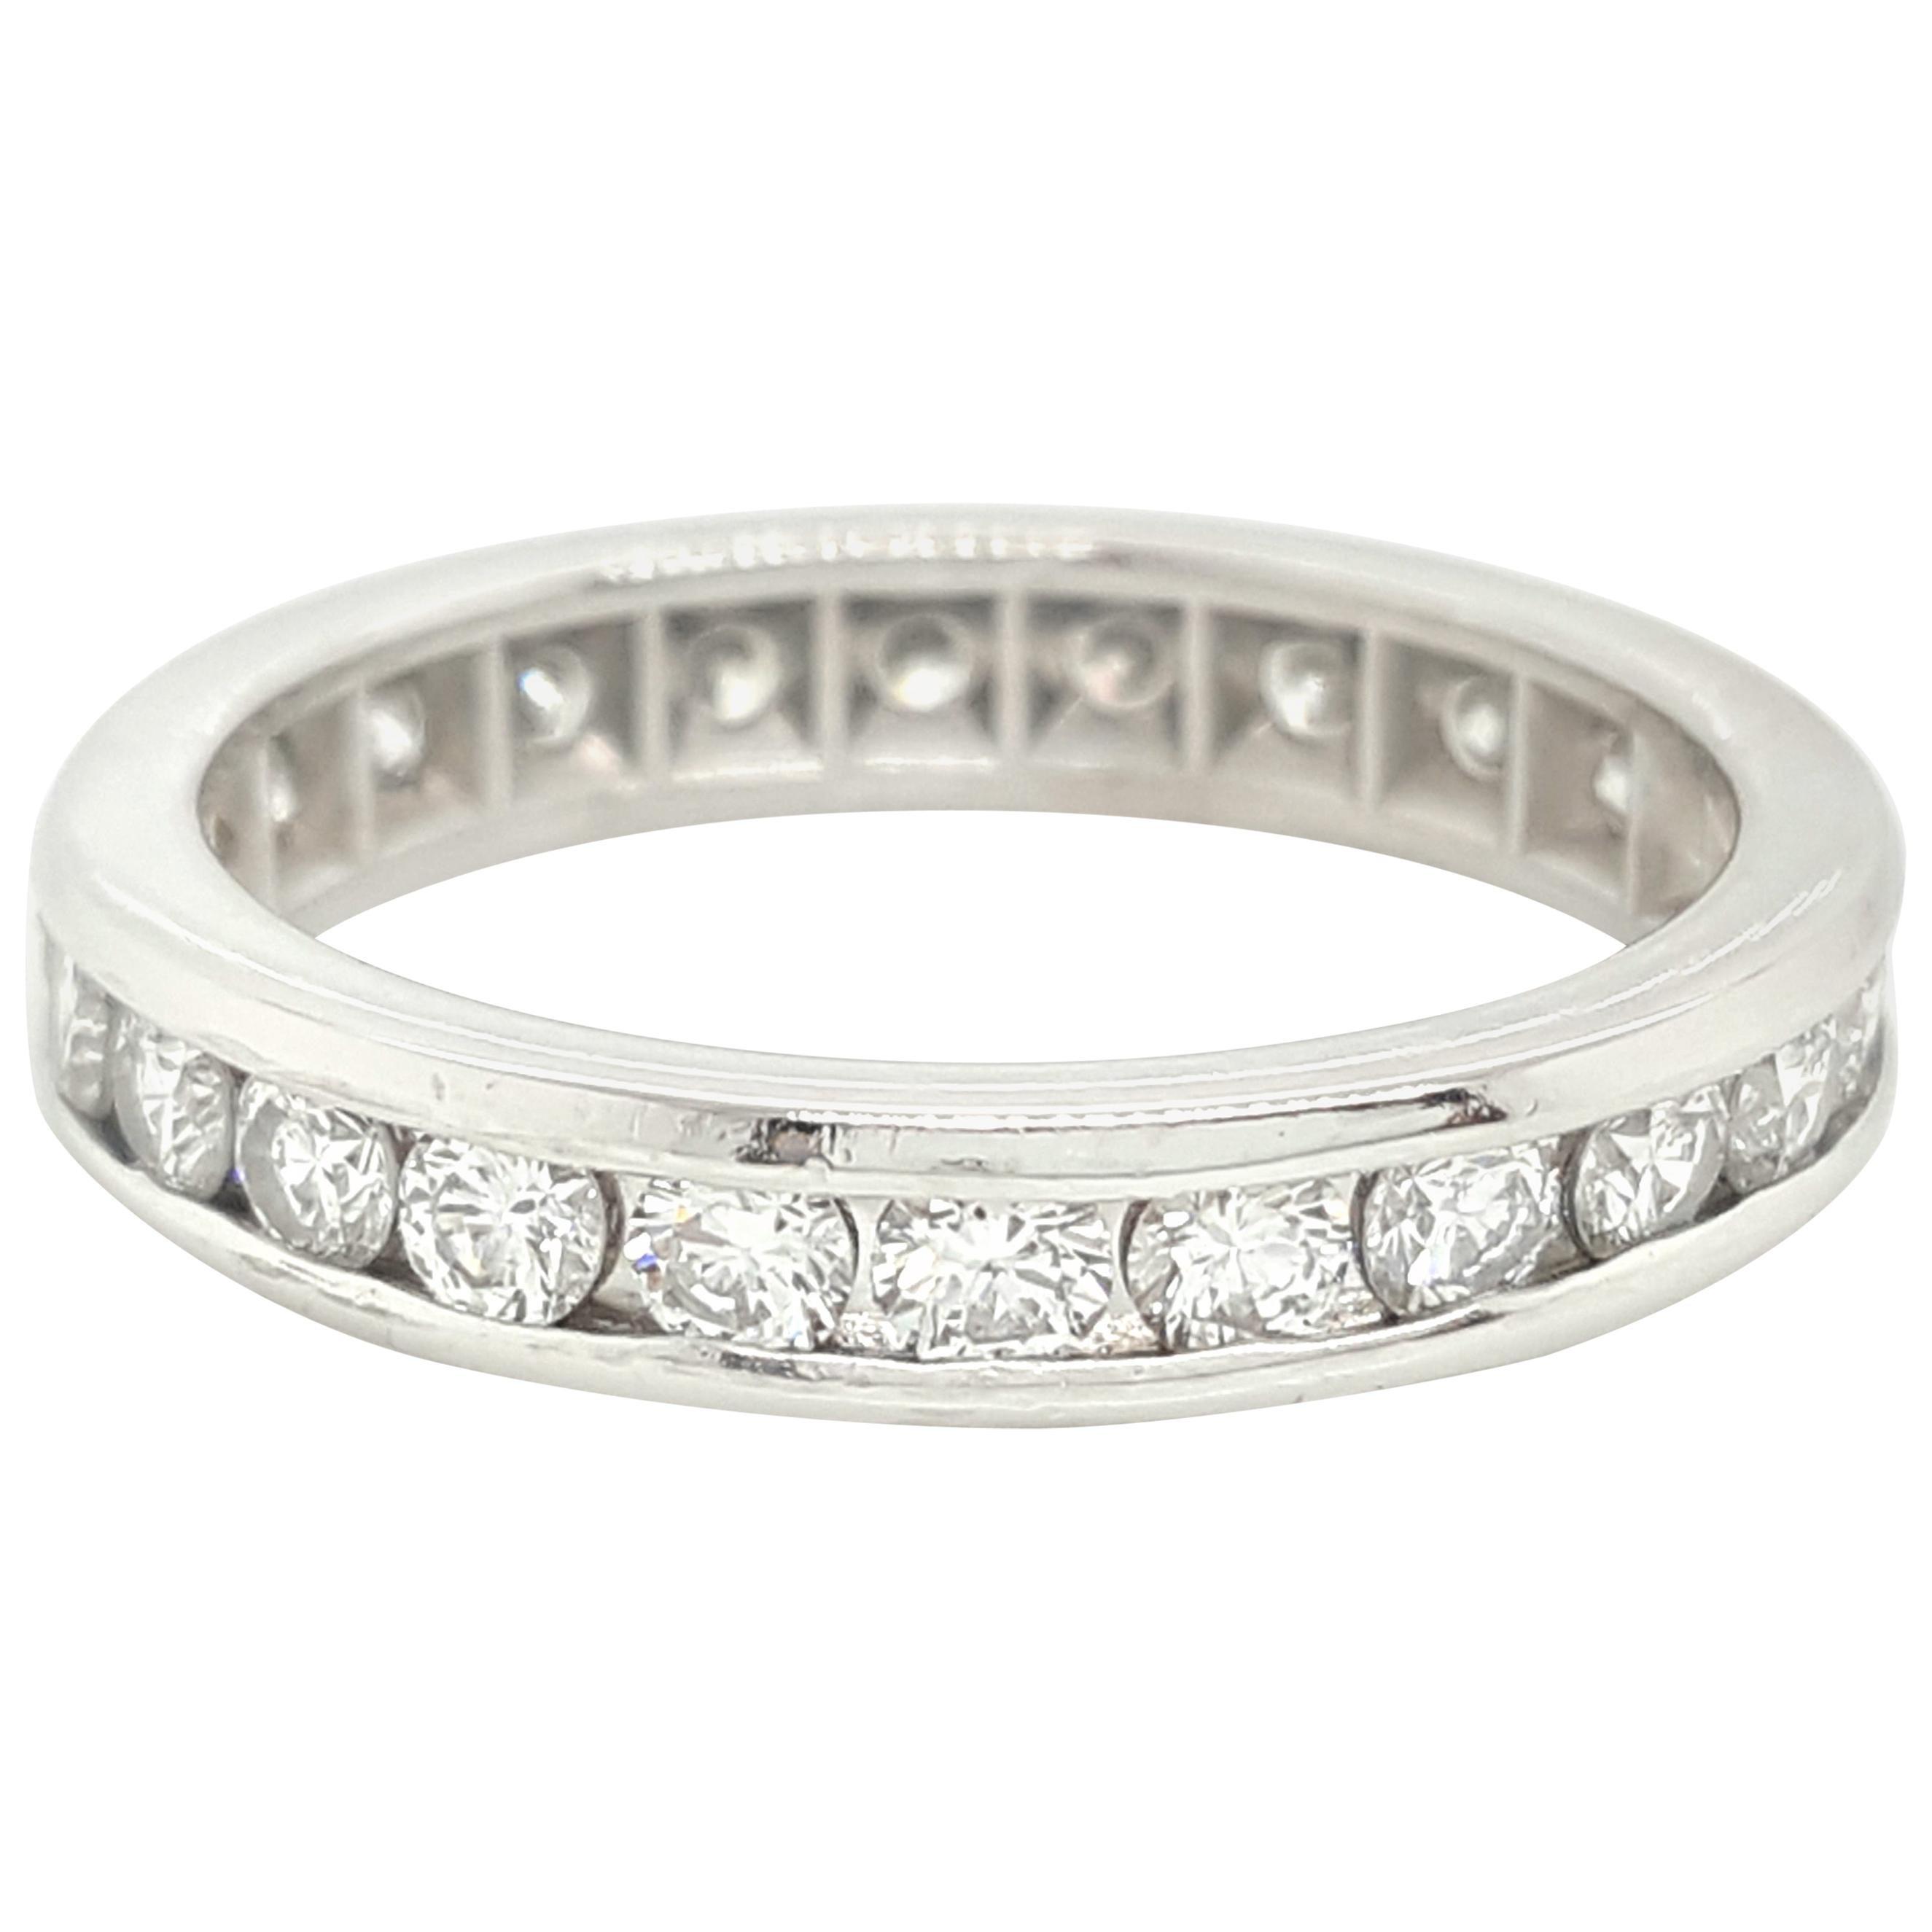 1.2 Carat Round Cut Diamond Vintage Platinum Eternity Band Ring, 1960s